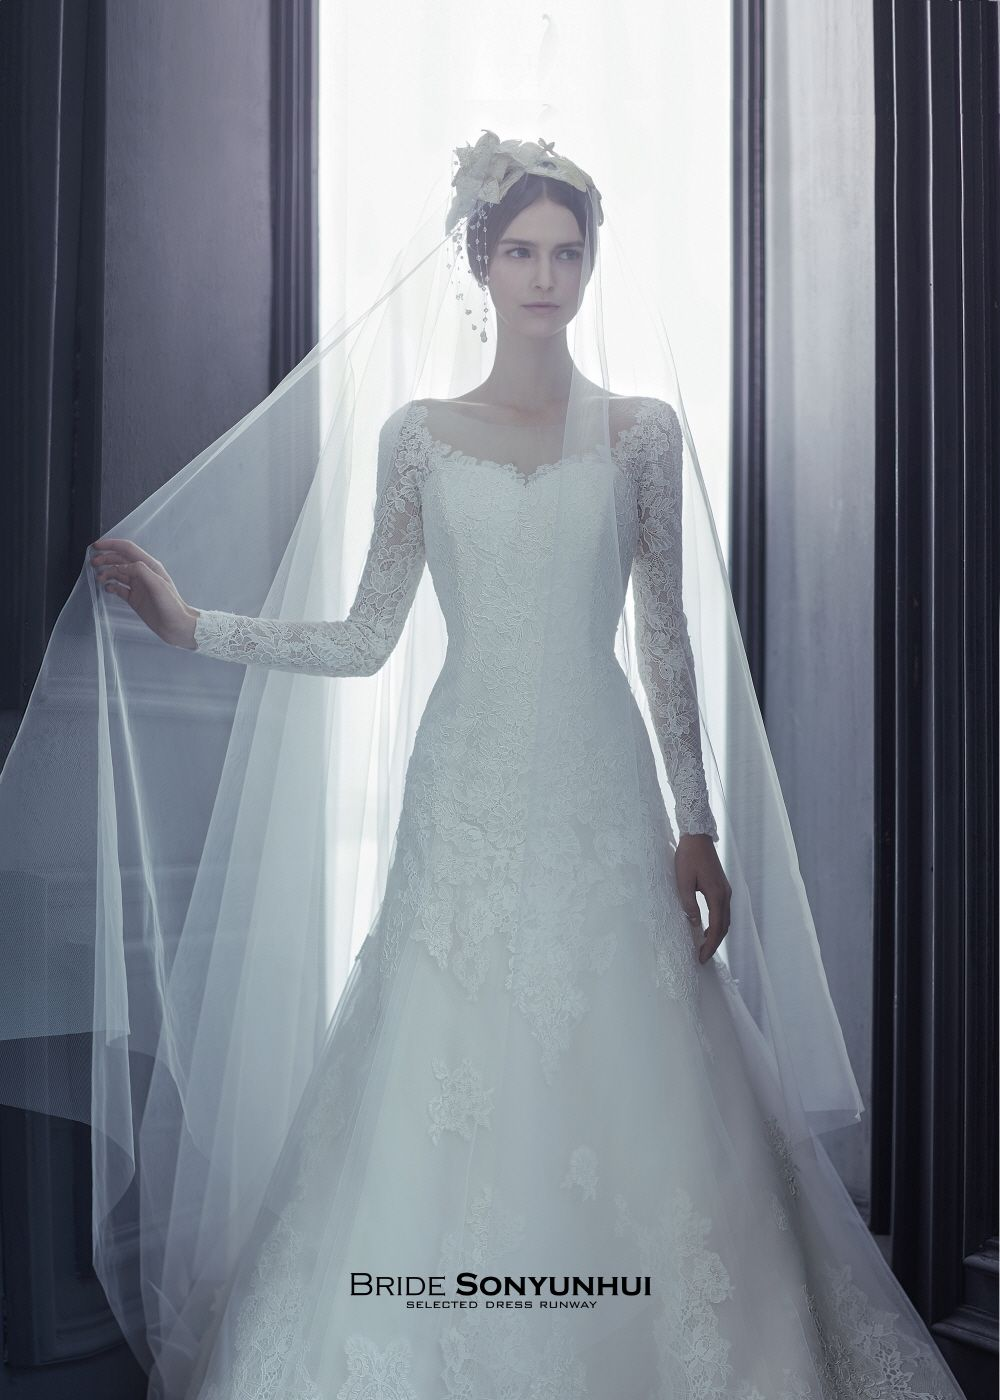 BRIDE SONYUNHUI VIDEO 26   wedding dresses   Pinterest